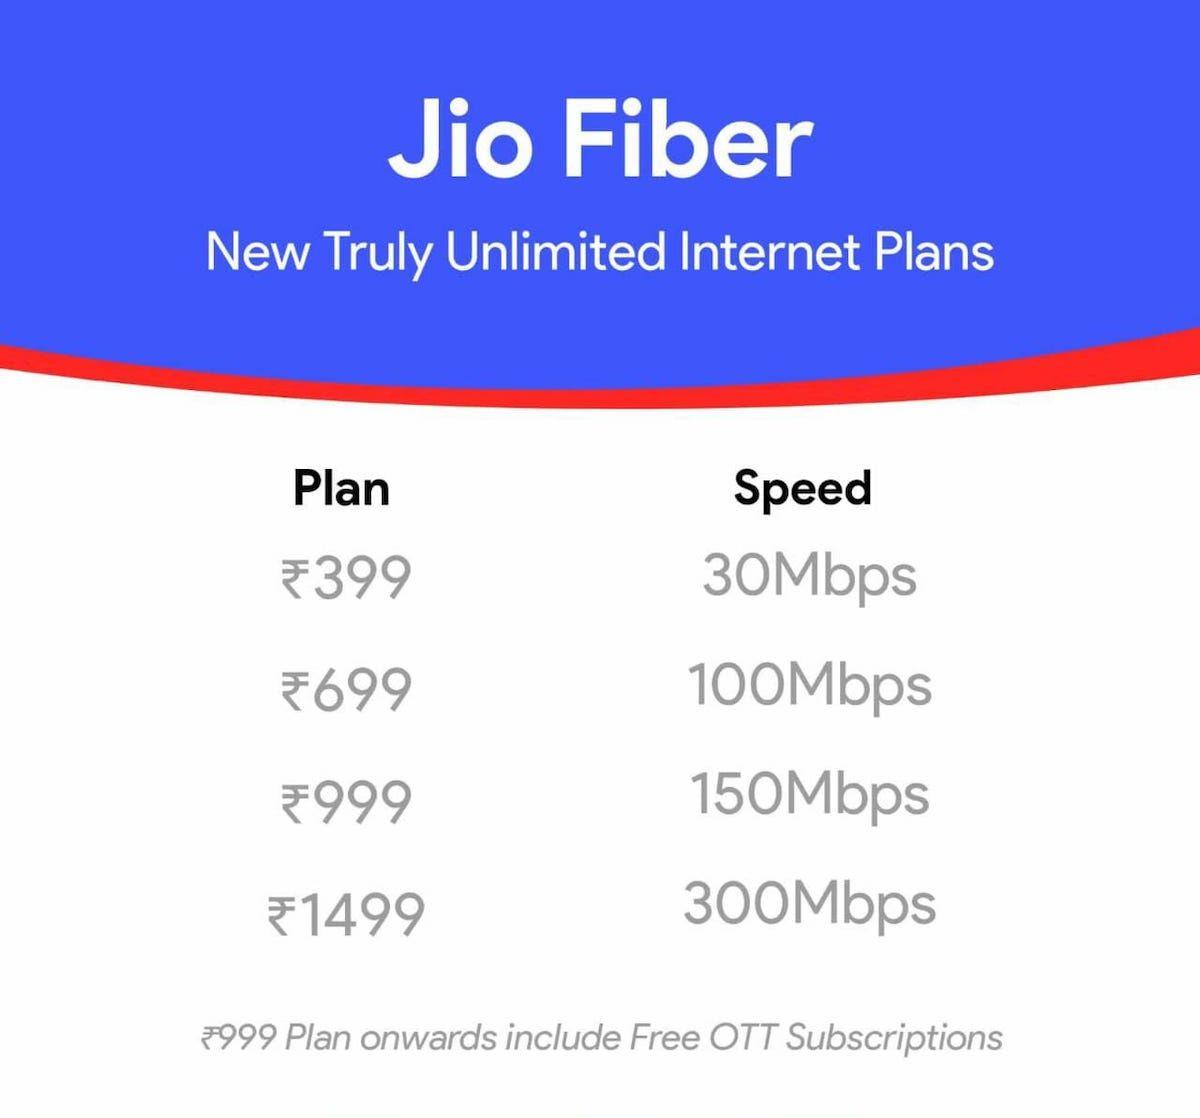 Jio Fiber New Plans